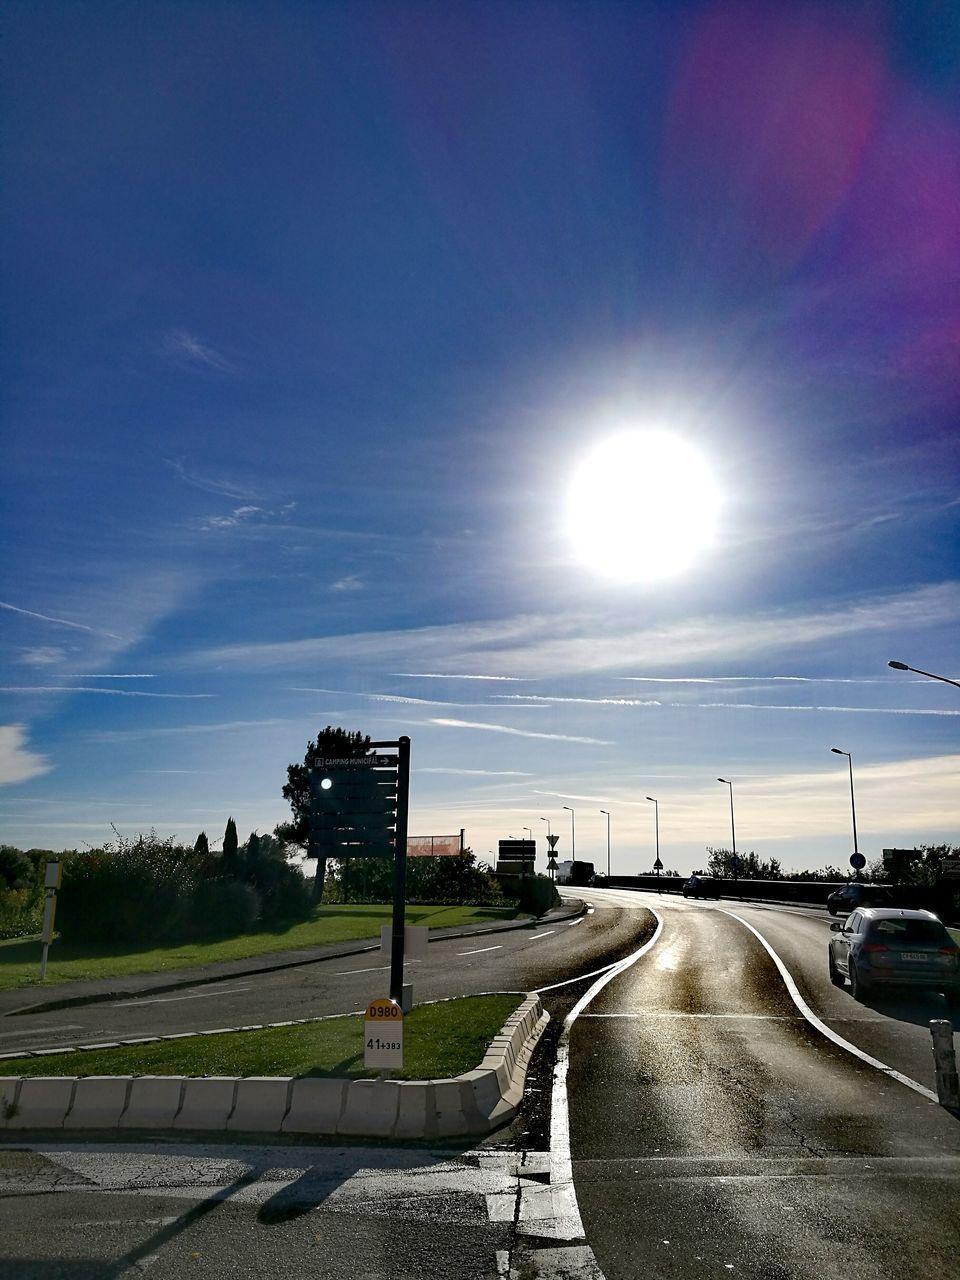 transportation, road, sky, the way forward, street, car, outdoors, sun, sunlight, street light, cloud - sky, no people, tree, day, nature, building exterior, city, architecture